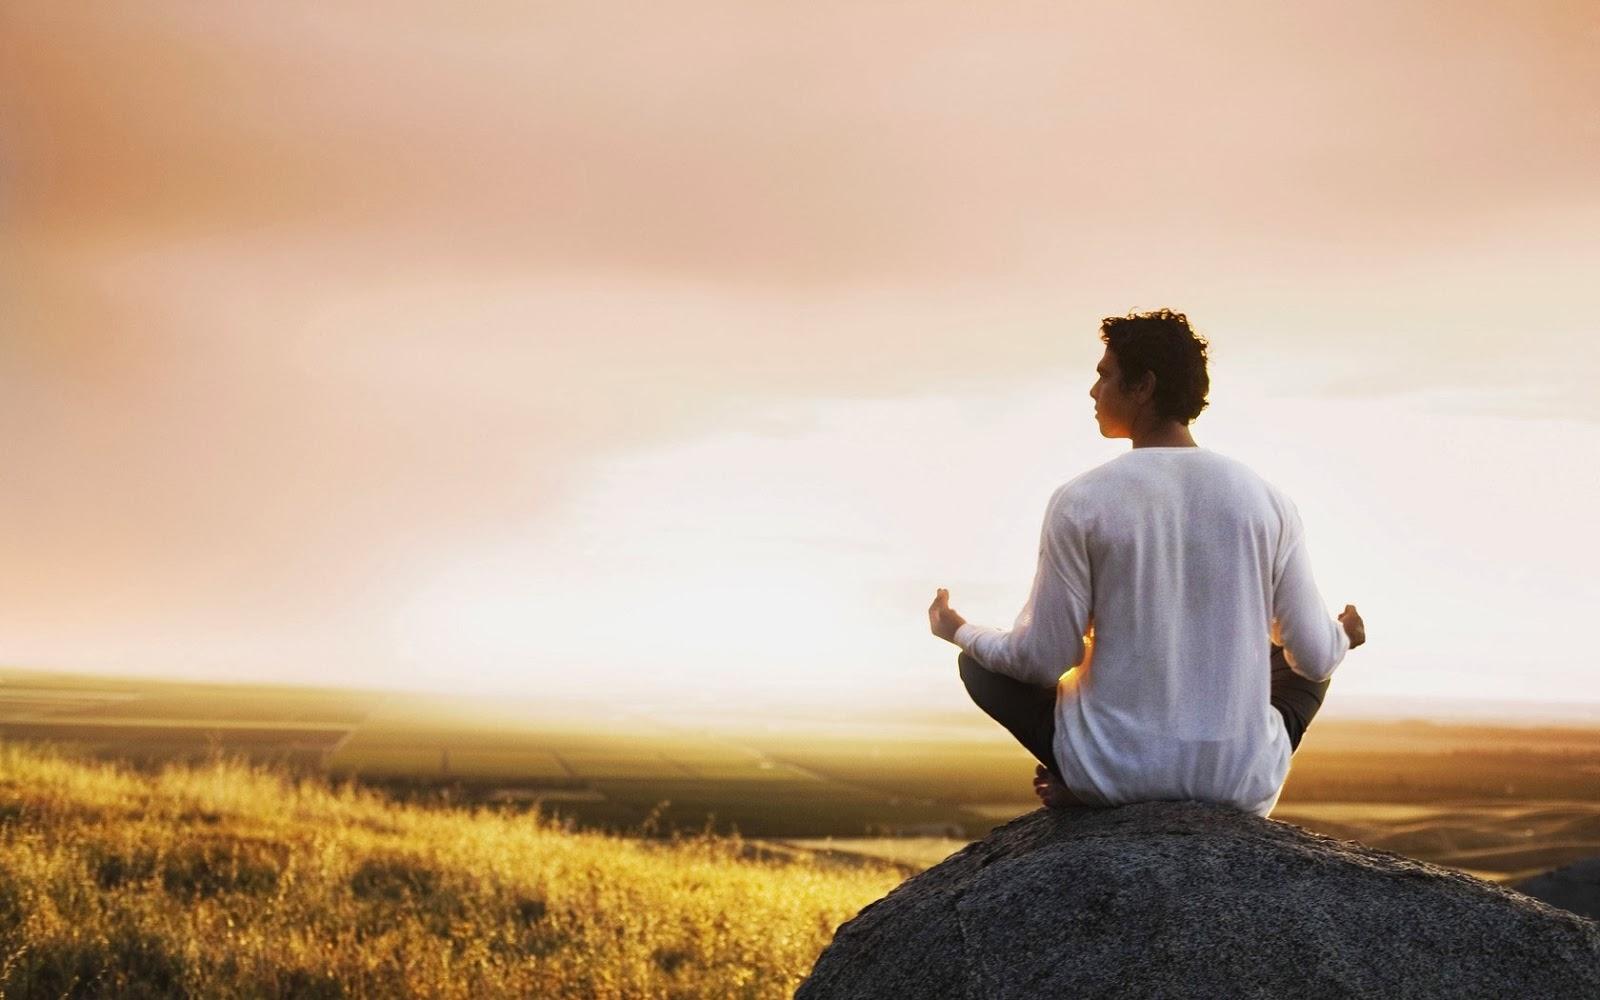 Onam Wallpapers Hd Meditation Hindu God Wallpapers Download